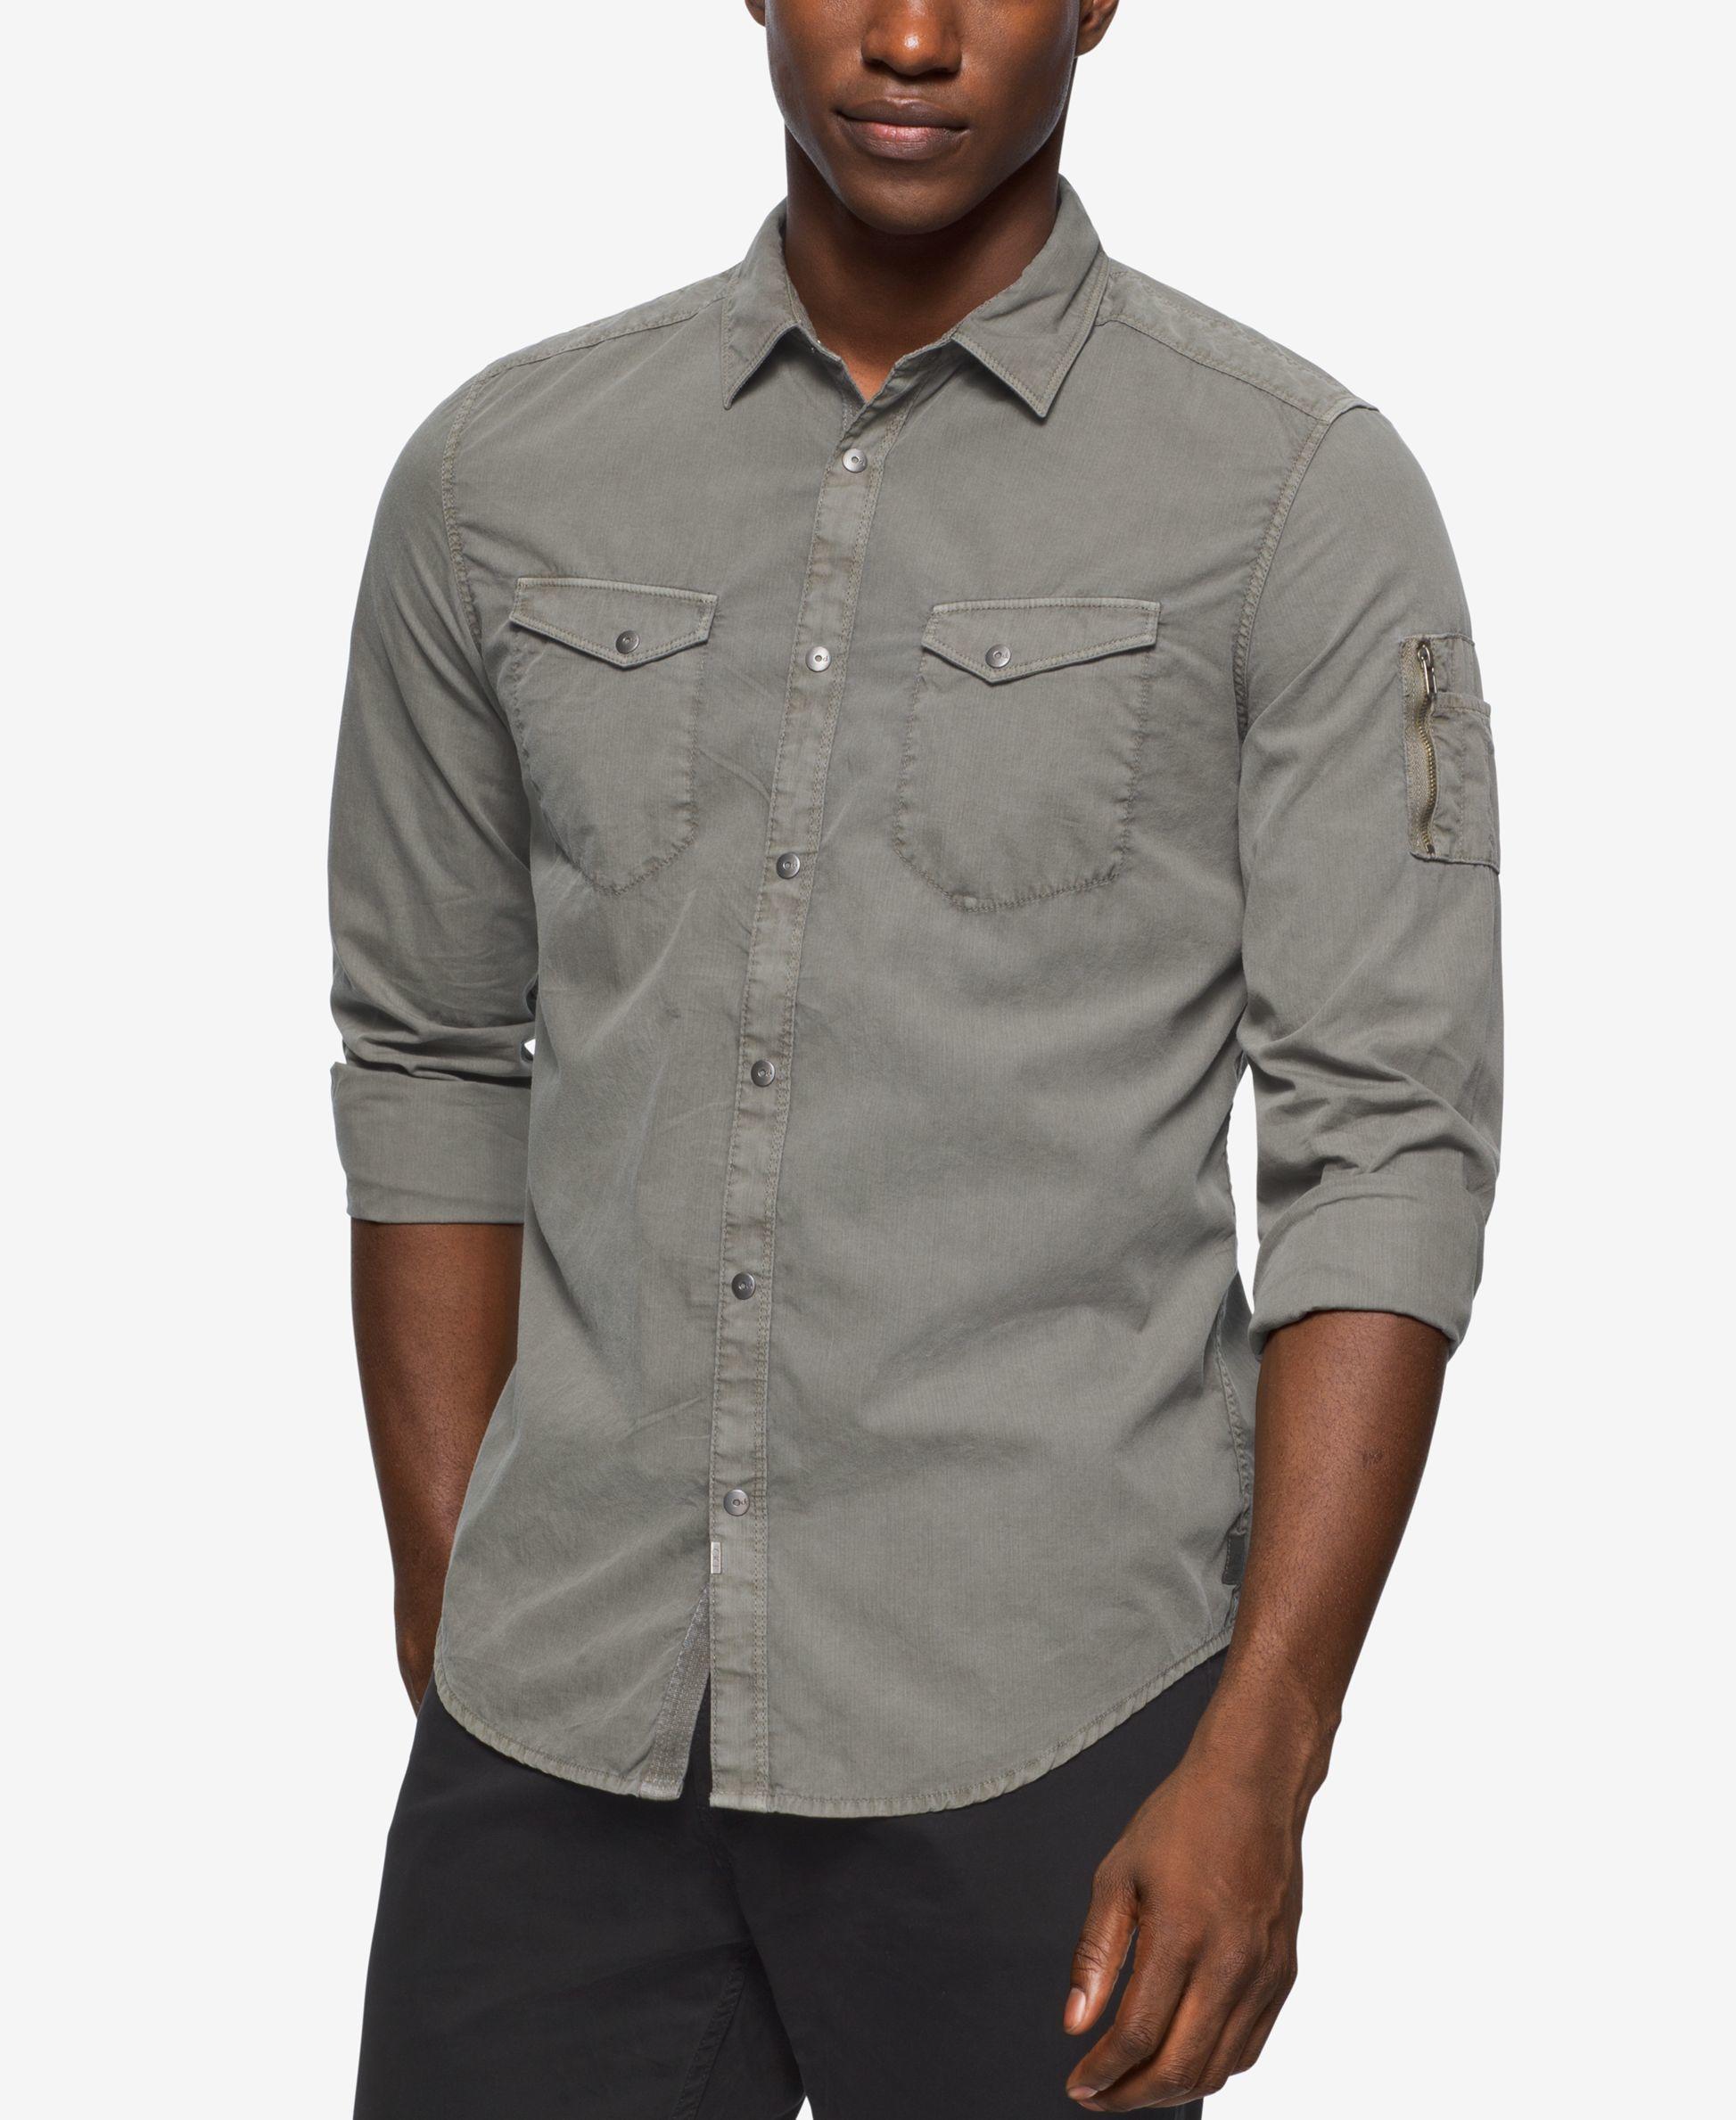 calvin klein jeans men 39 s garment dyed aviator shirt in. Black Bedroom Furniture Sets. Home Design Ideas